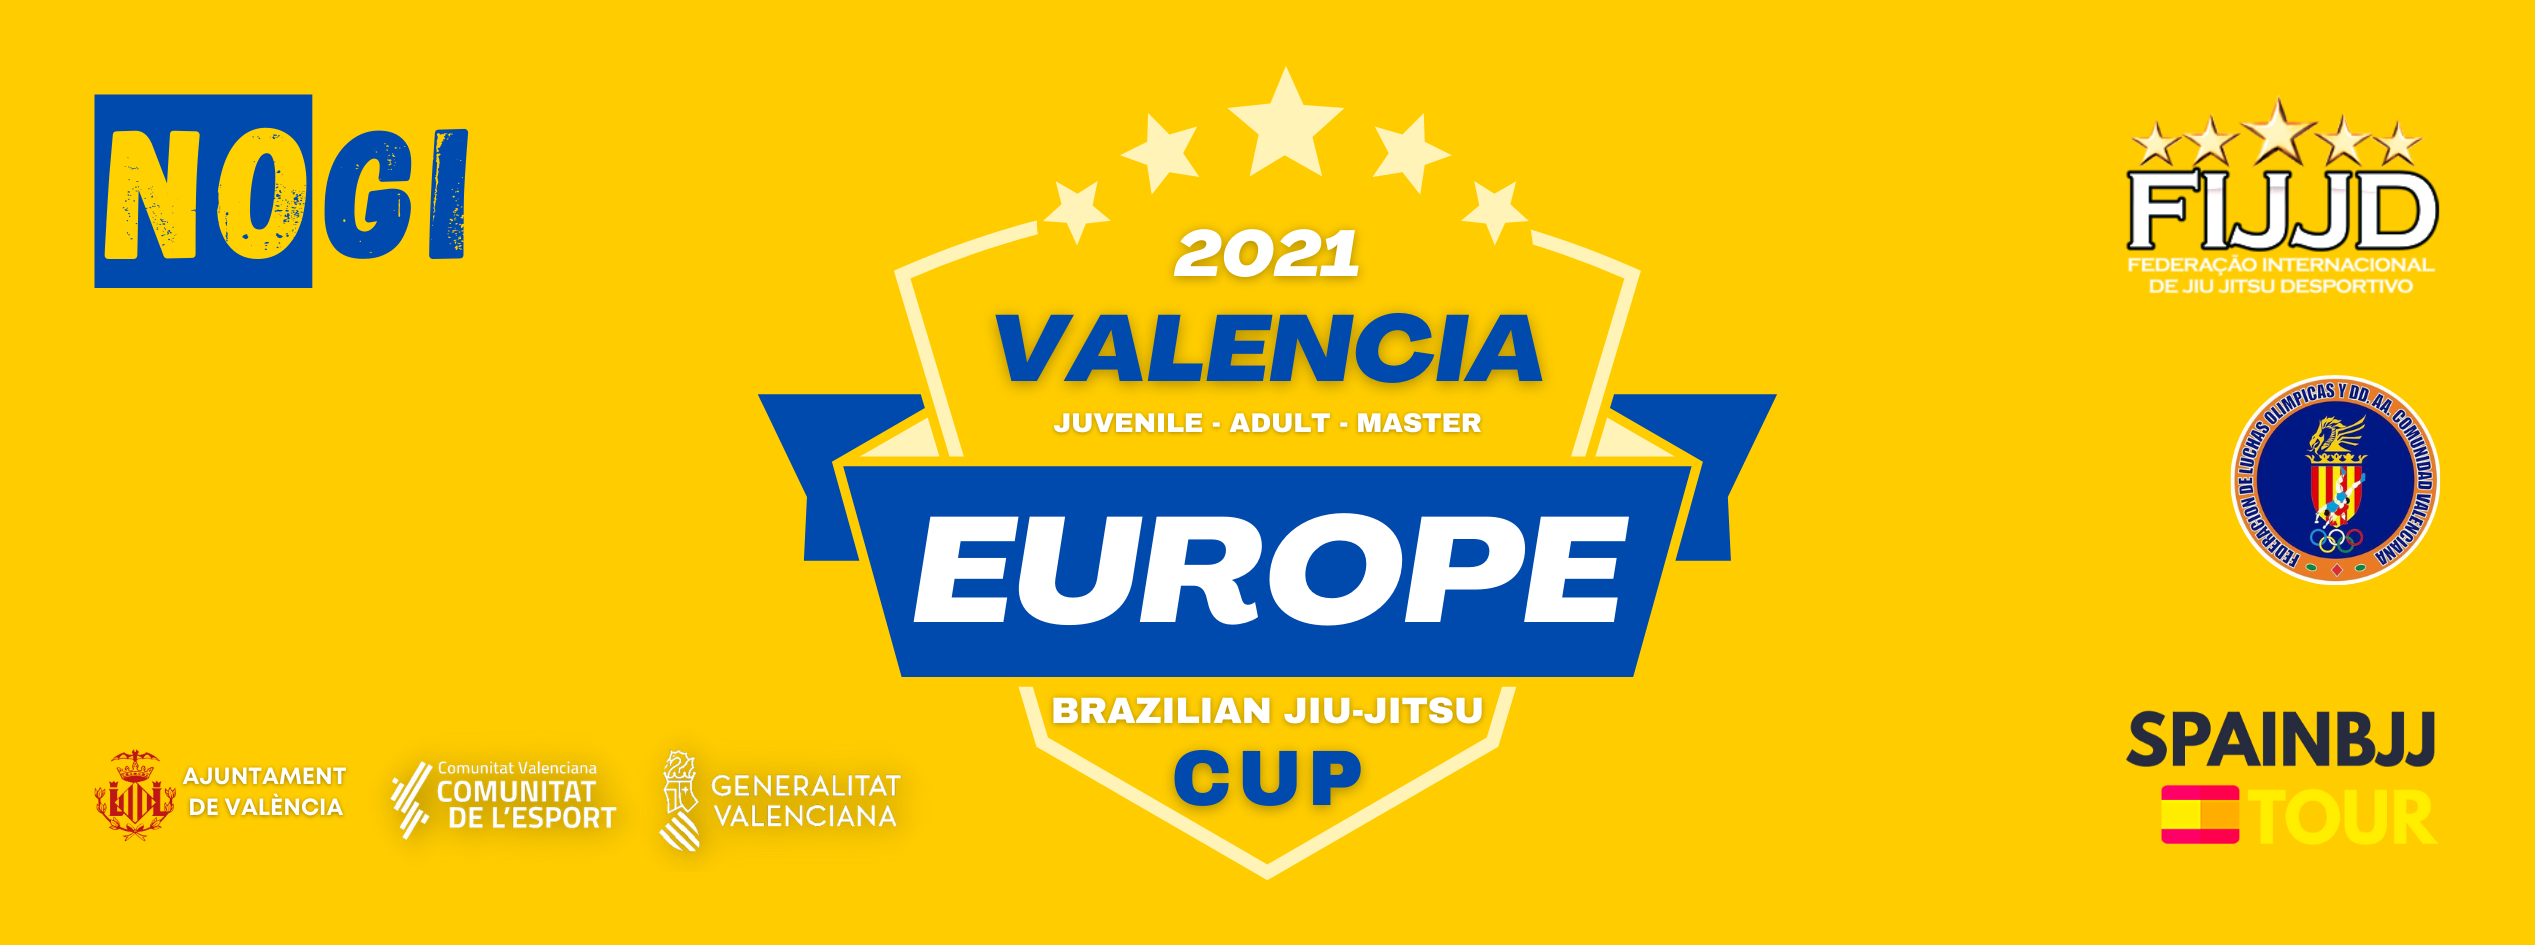 EUROPE CUP BJJ NoGi 2021